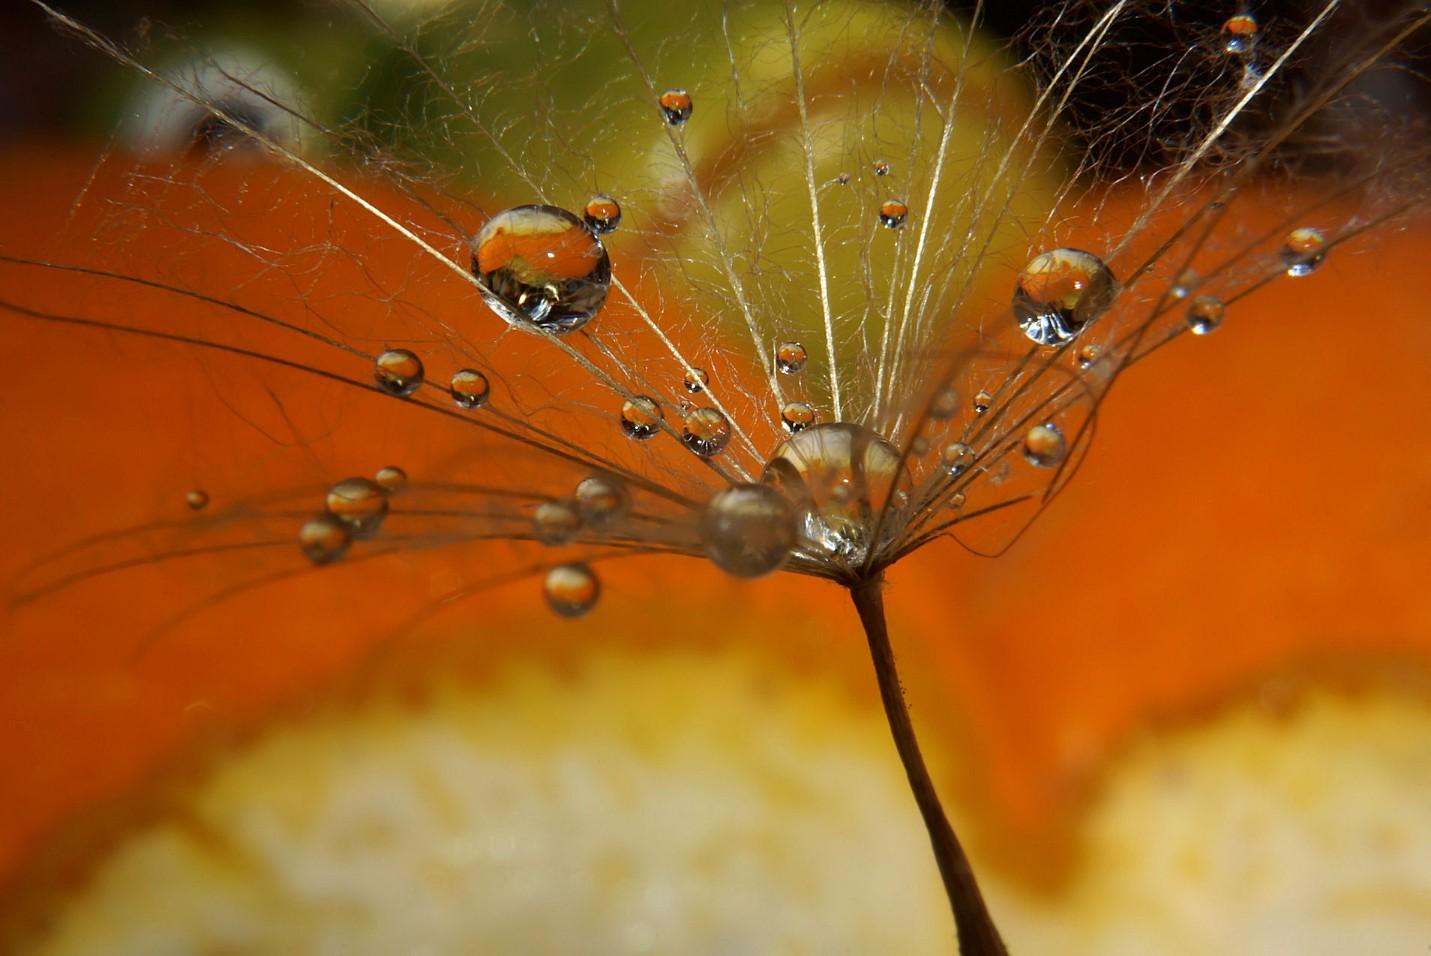 wiesenbocksbartpusteblume.jpg